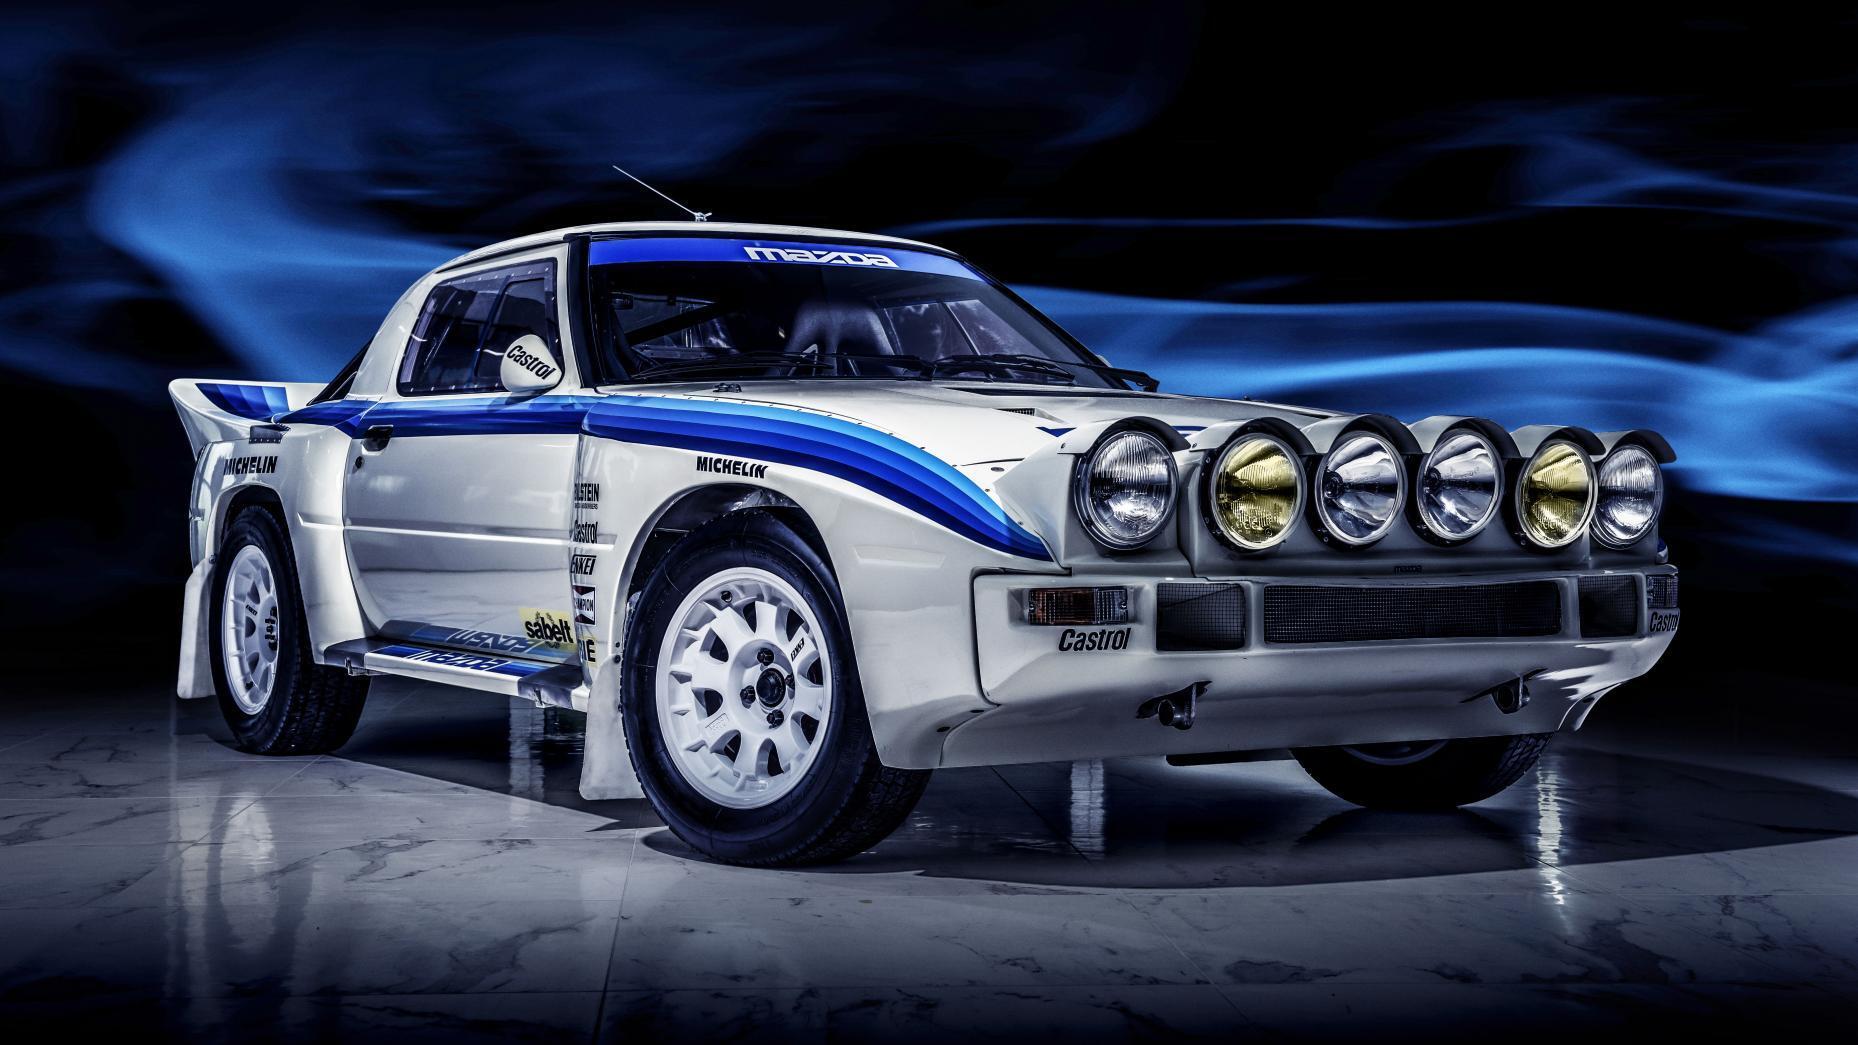 The nine maddest rally cars ever